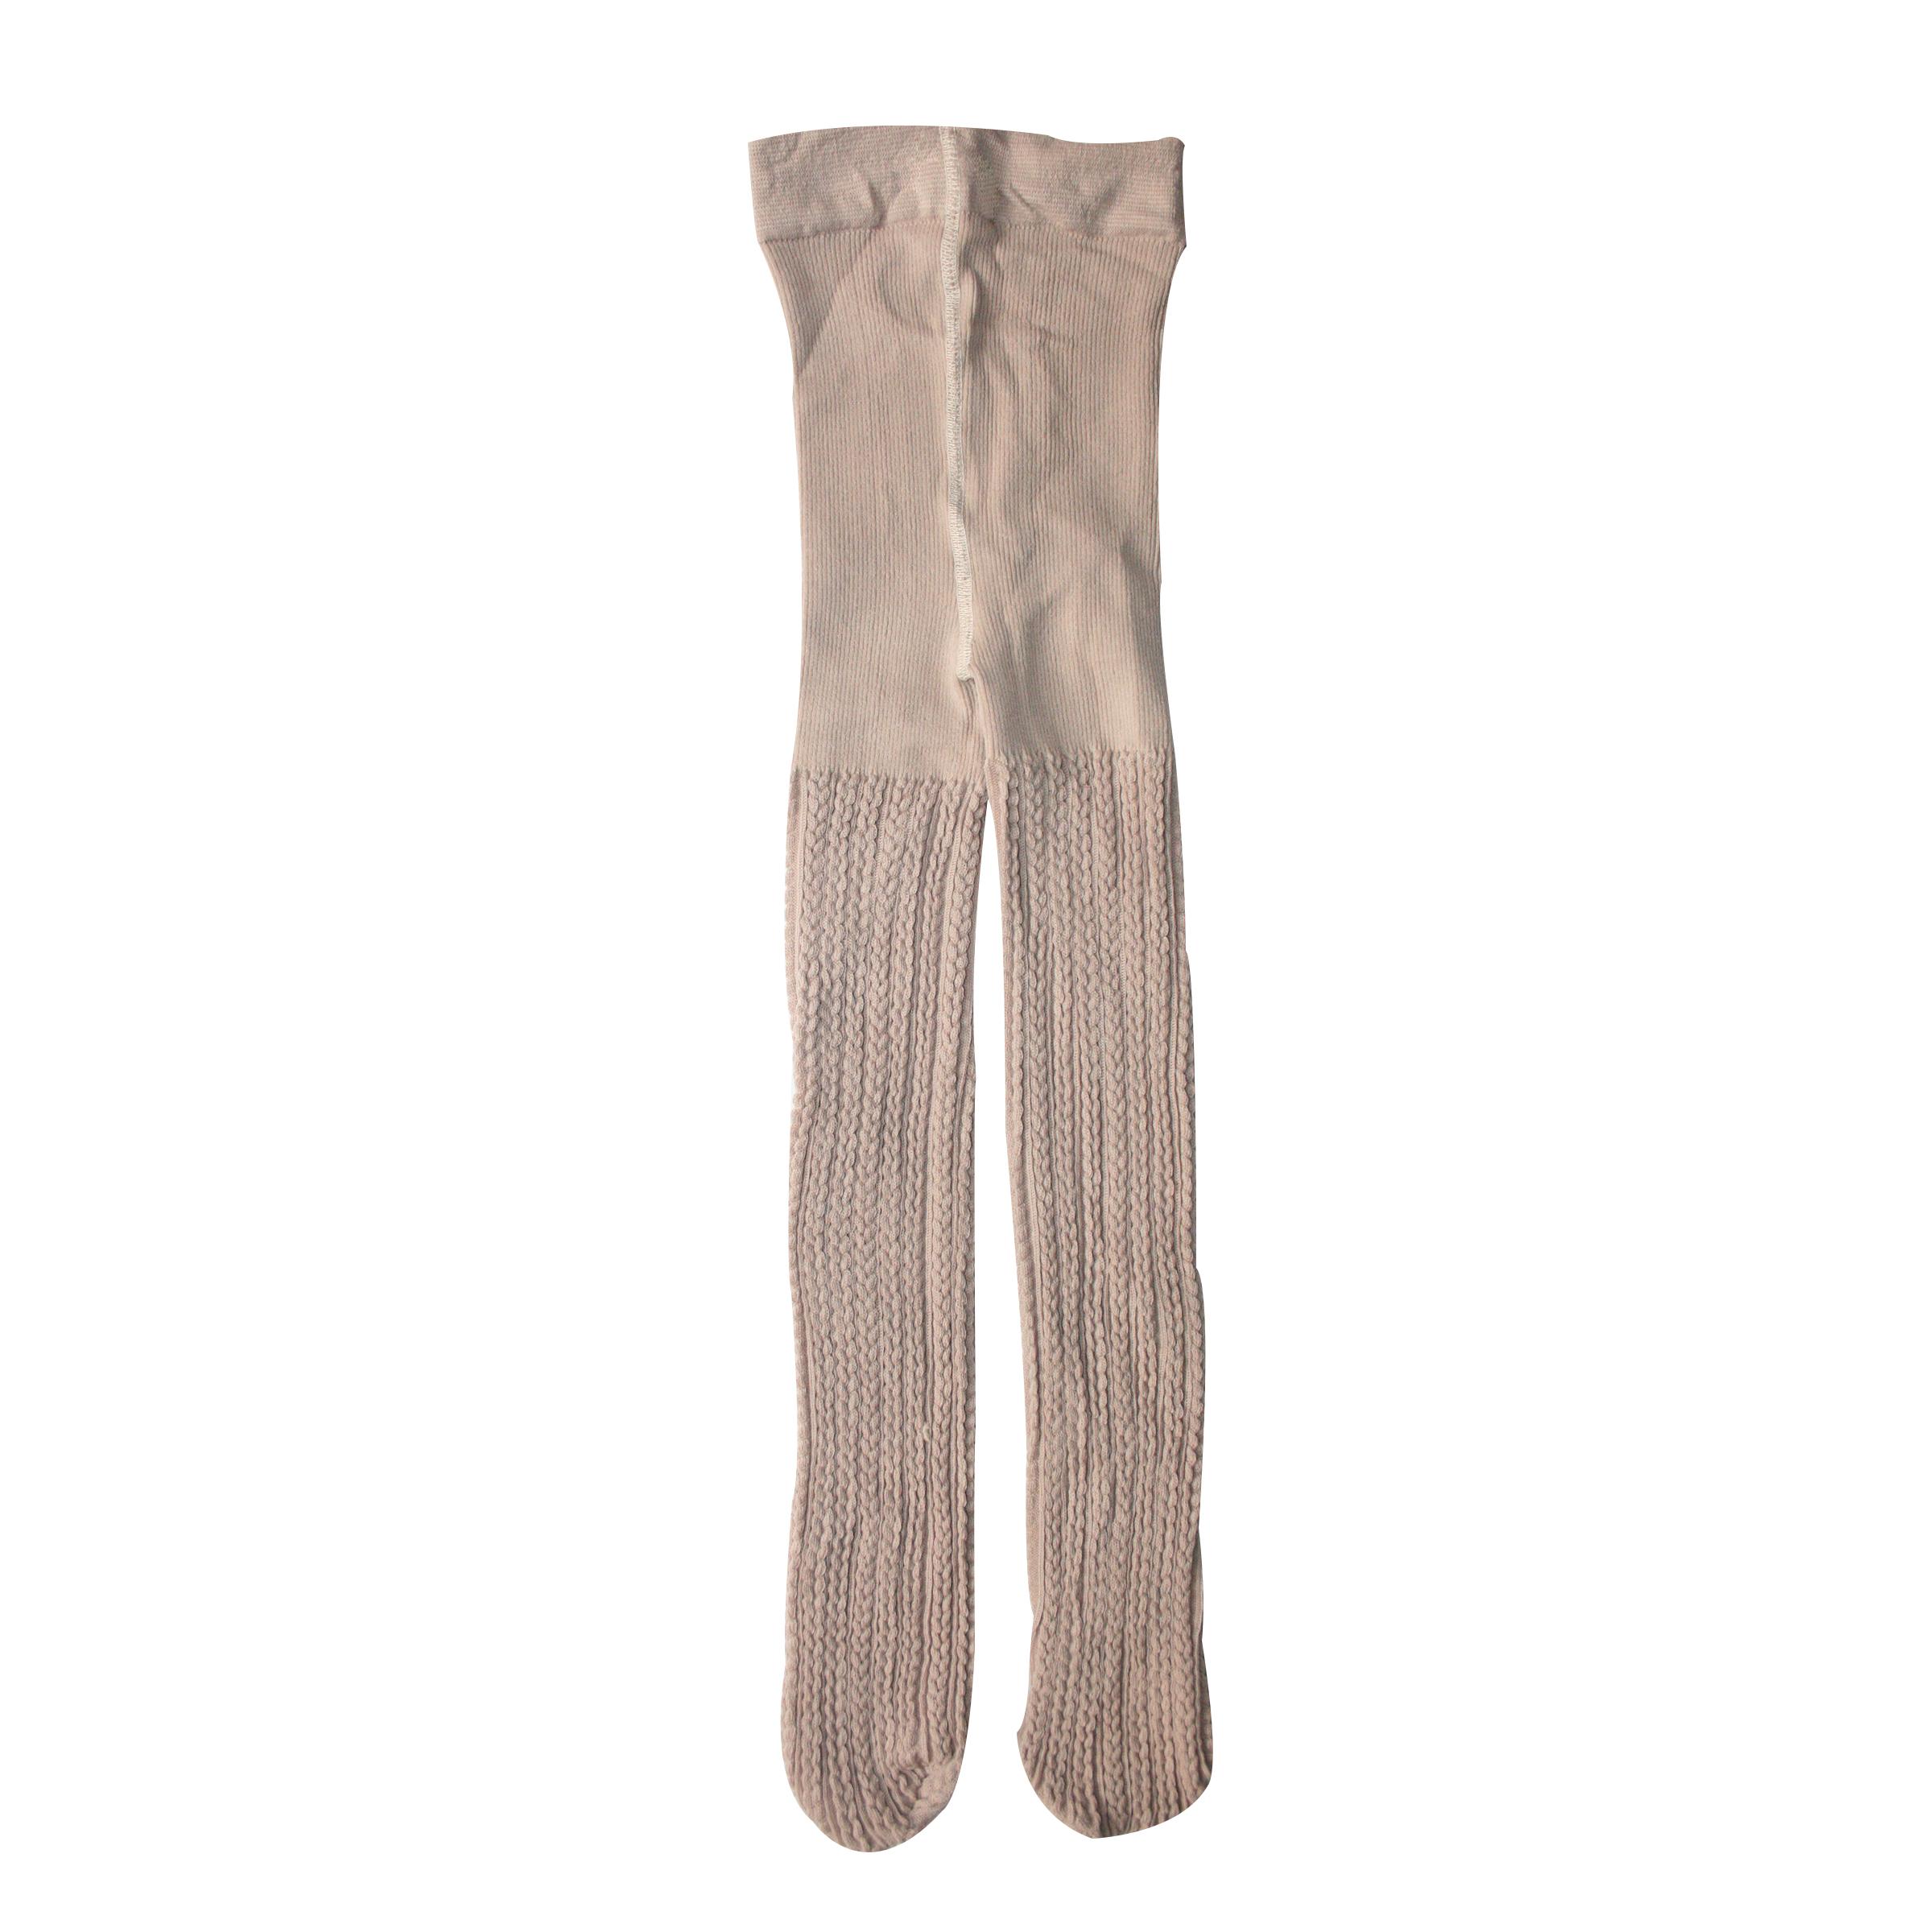 جوراب شلواری زنانه ایوا کد 1059